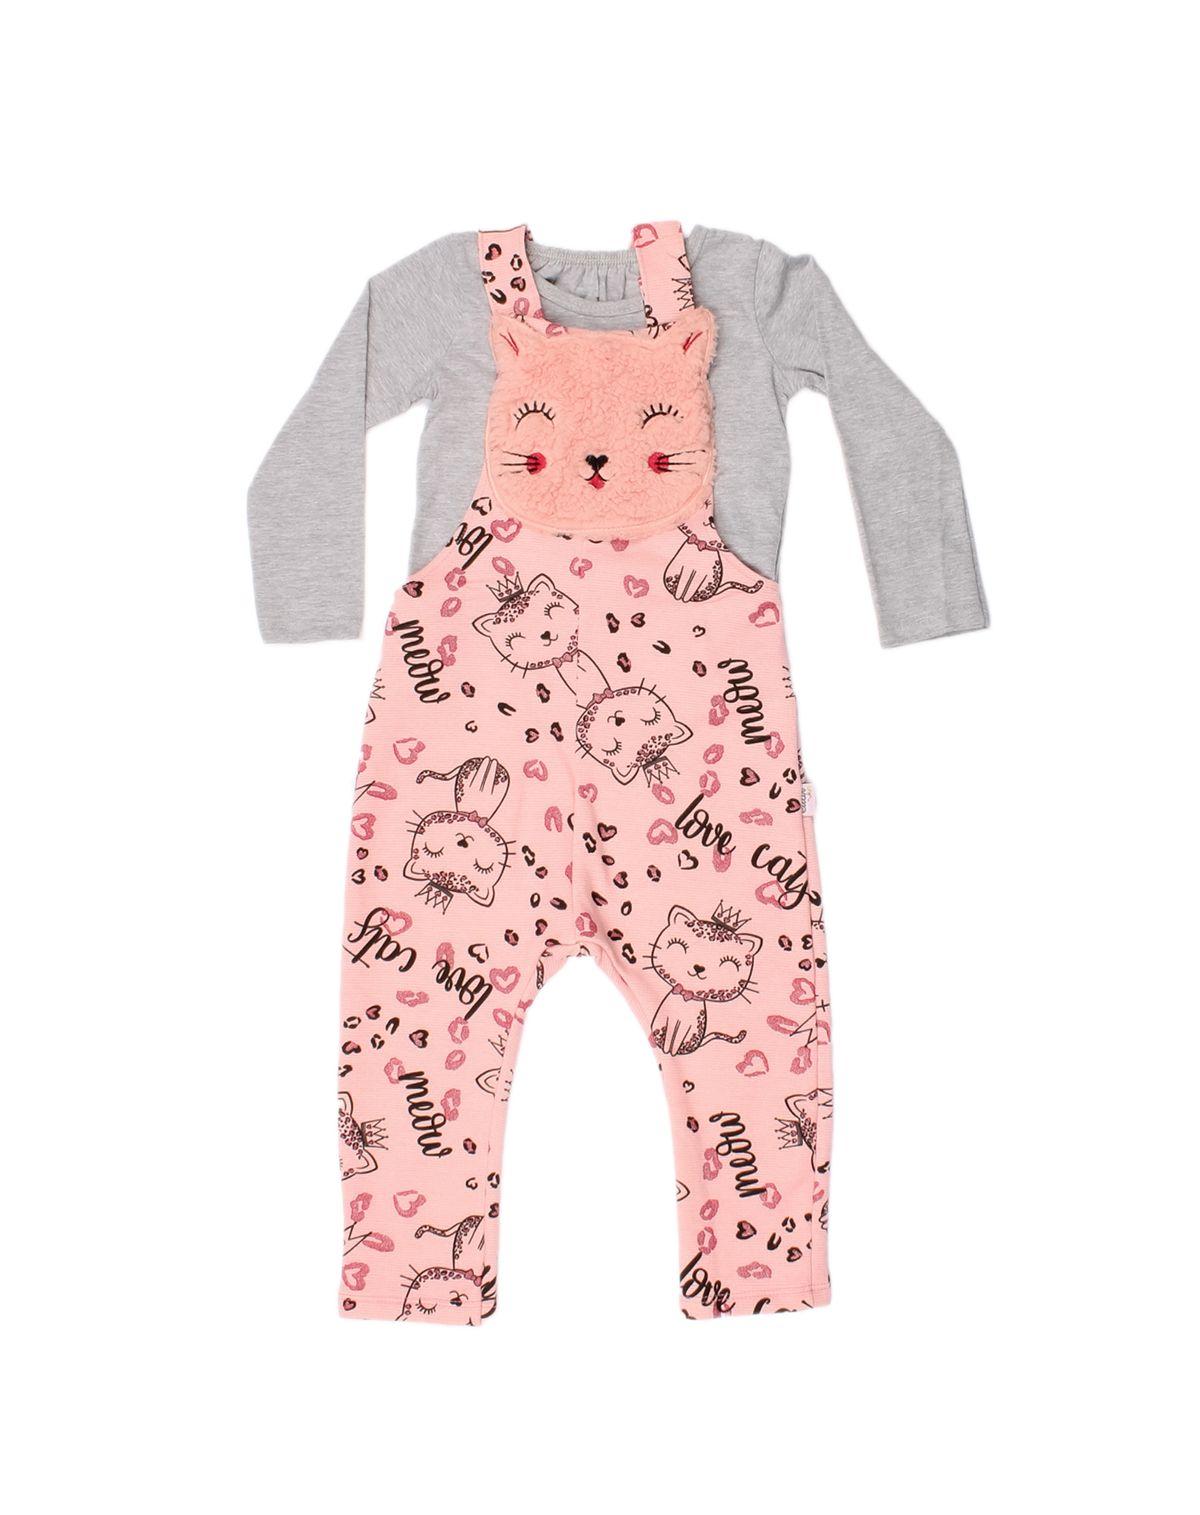 578338003-jardineira-bebe-estampa-gatinho-rosa-3-bbb